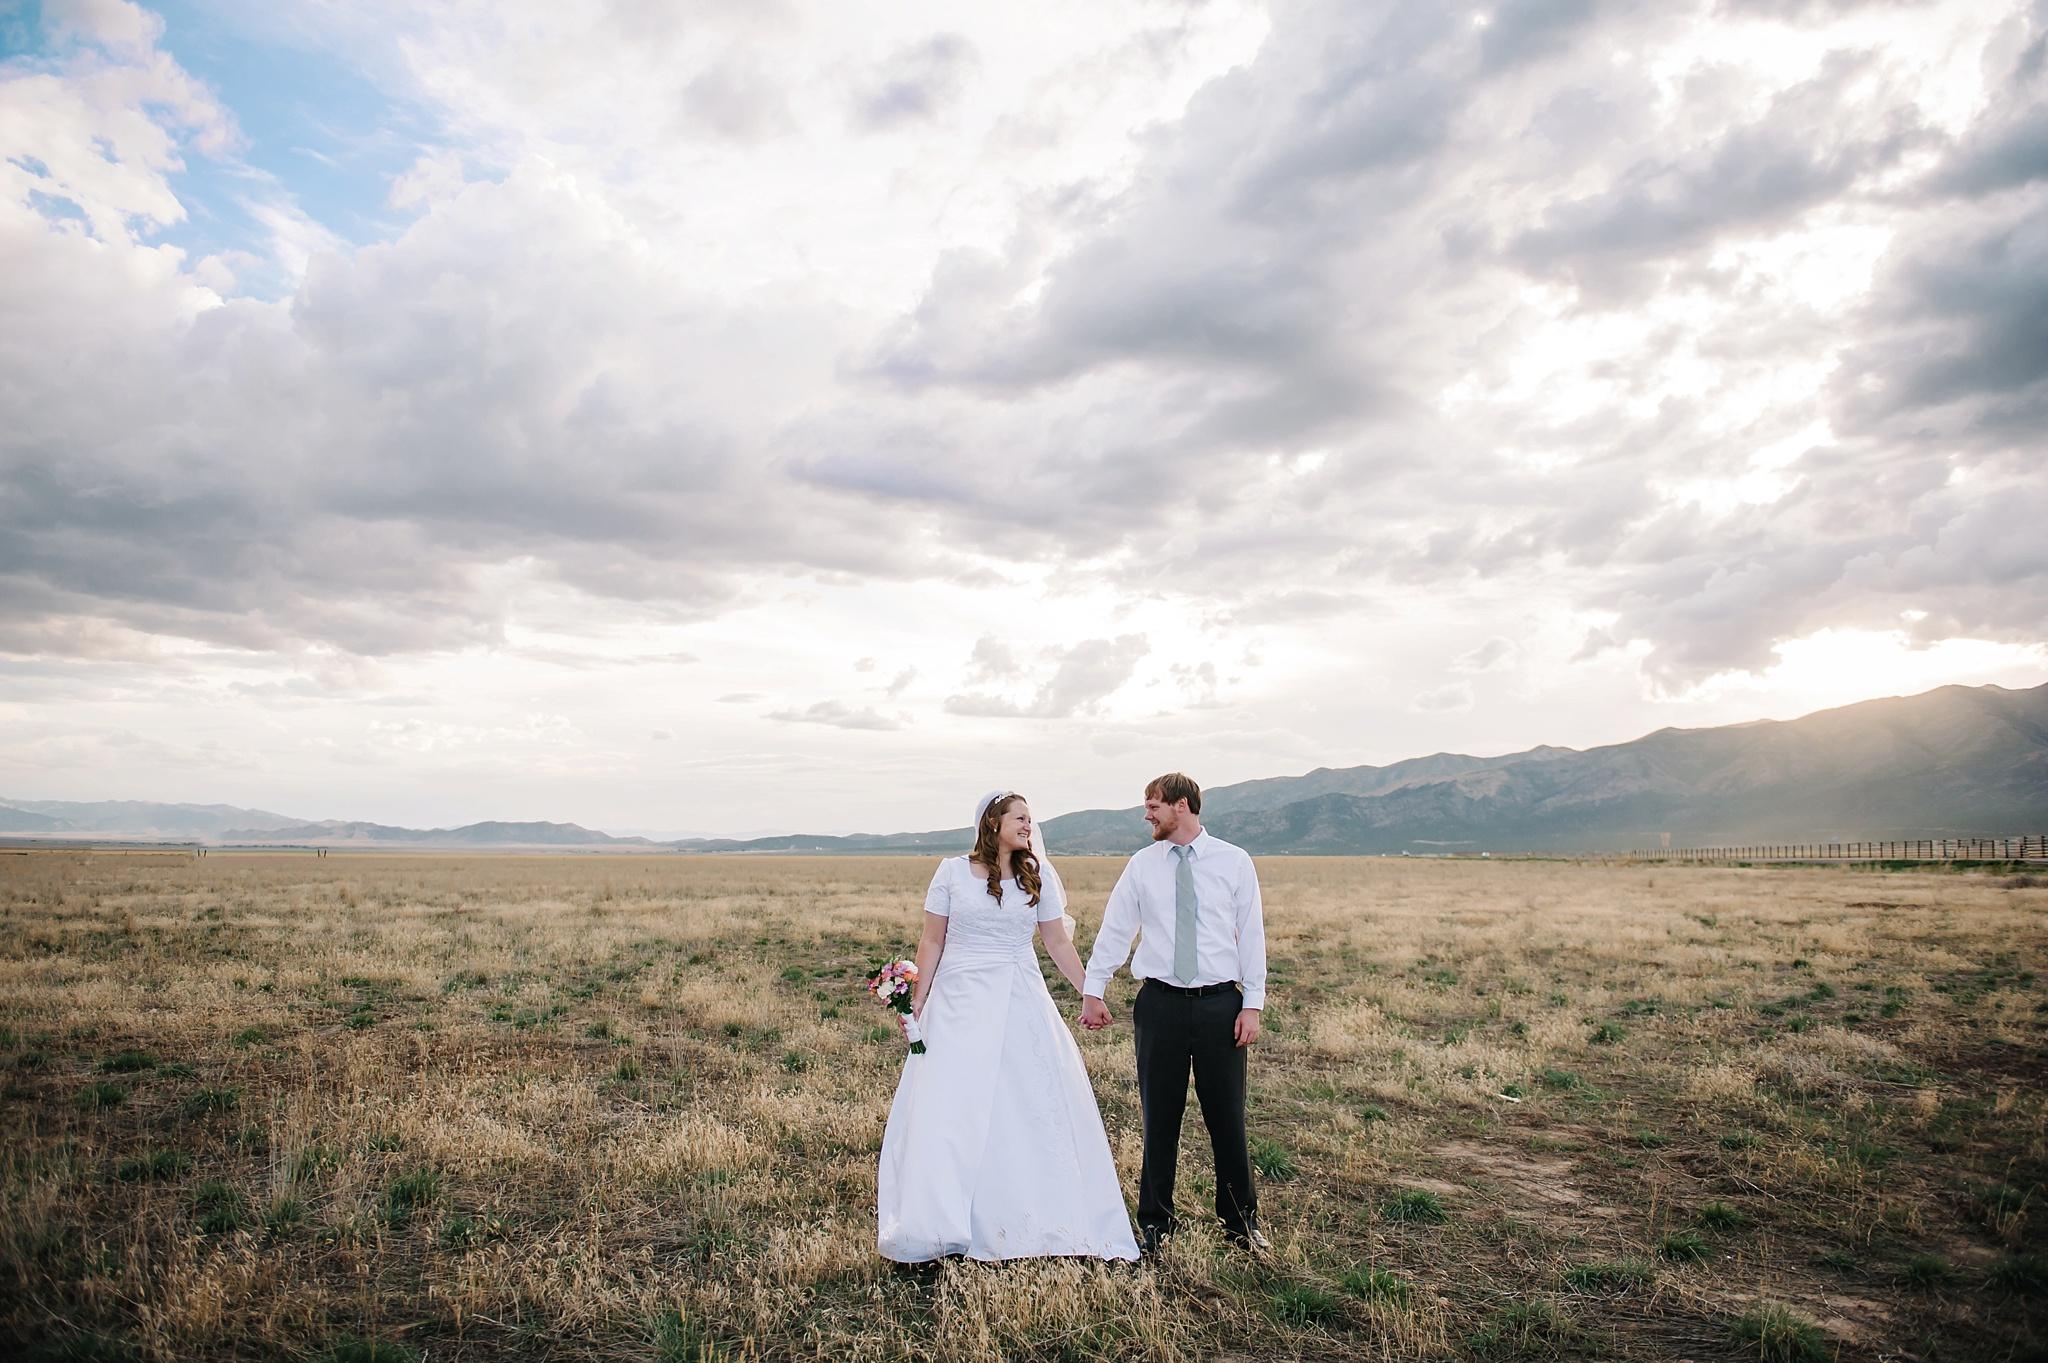 Utah Salt Lake Family Photographer Ali Sumsion 022